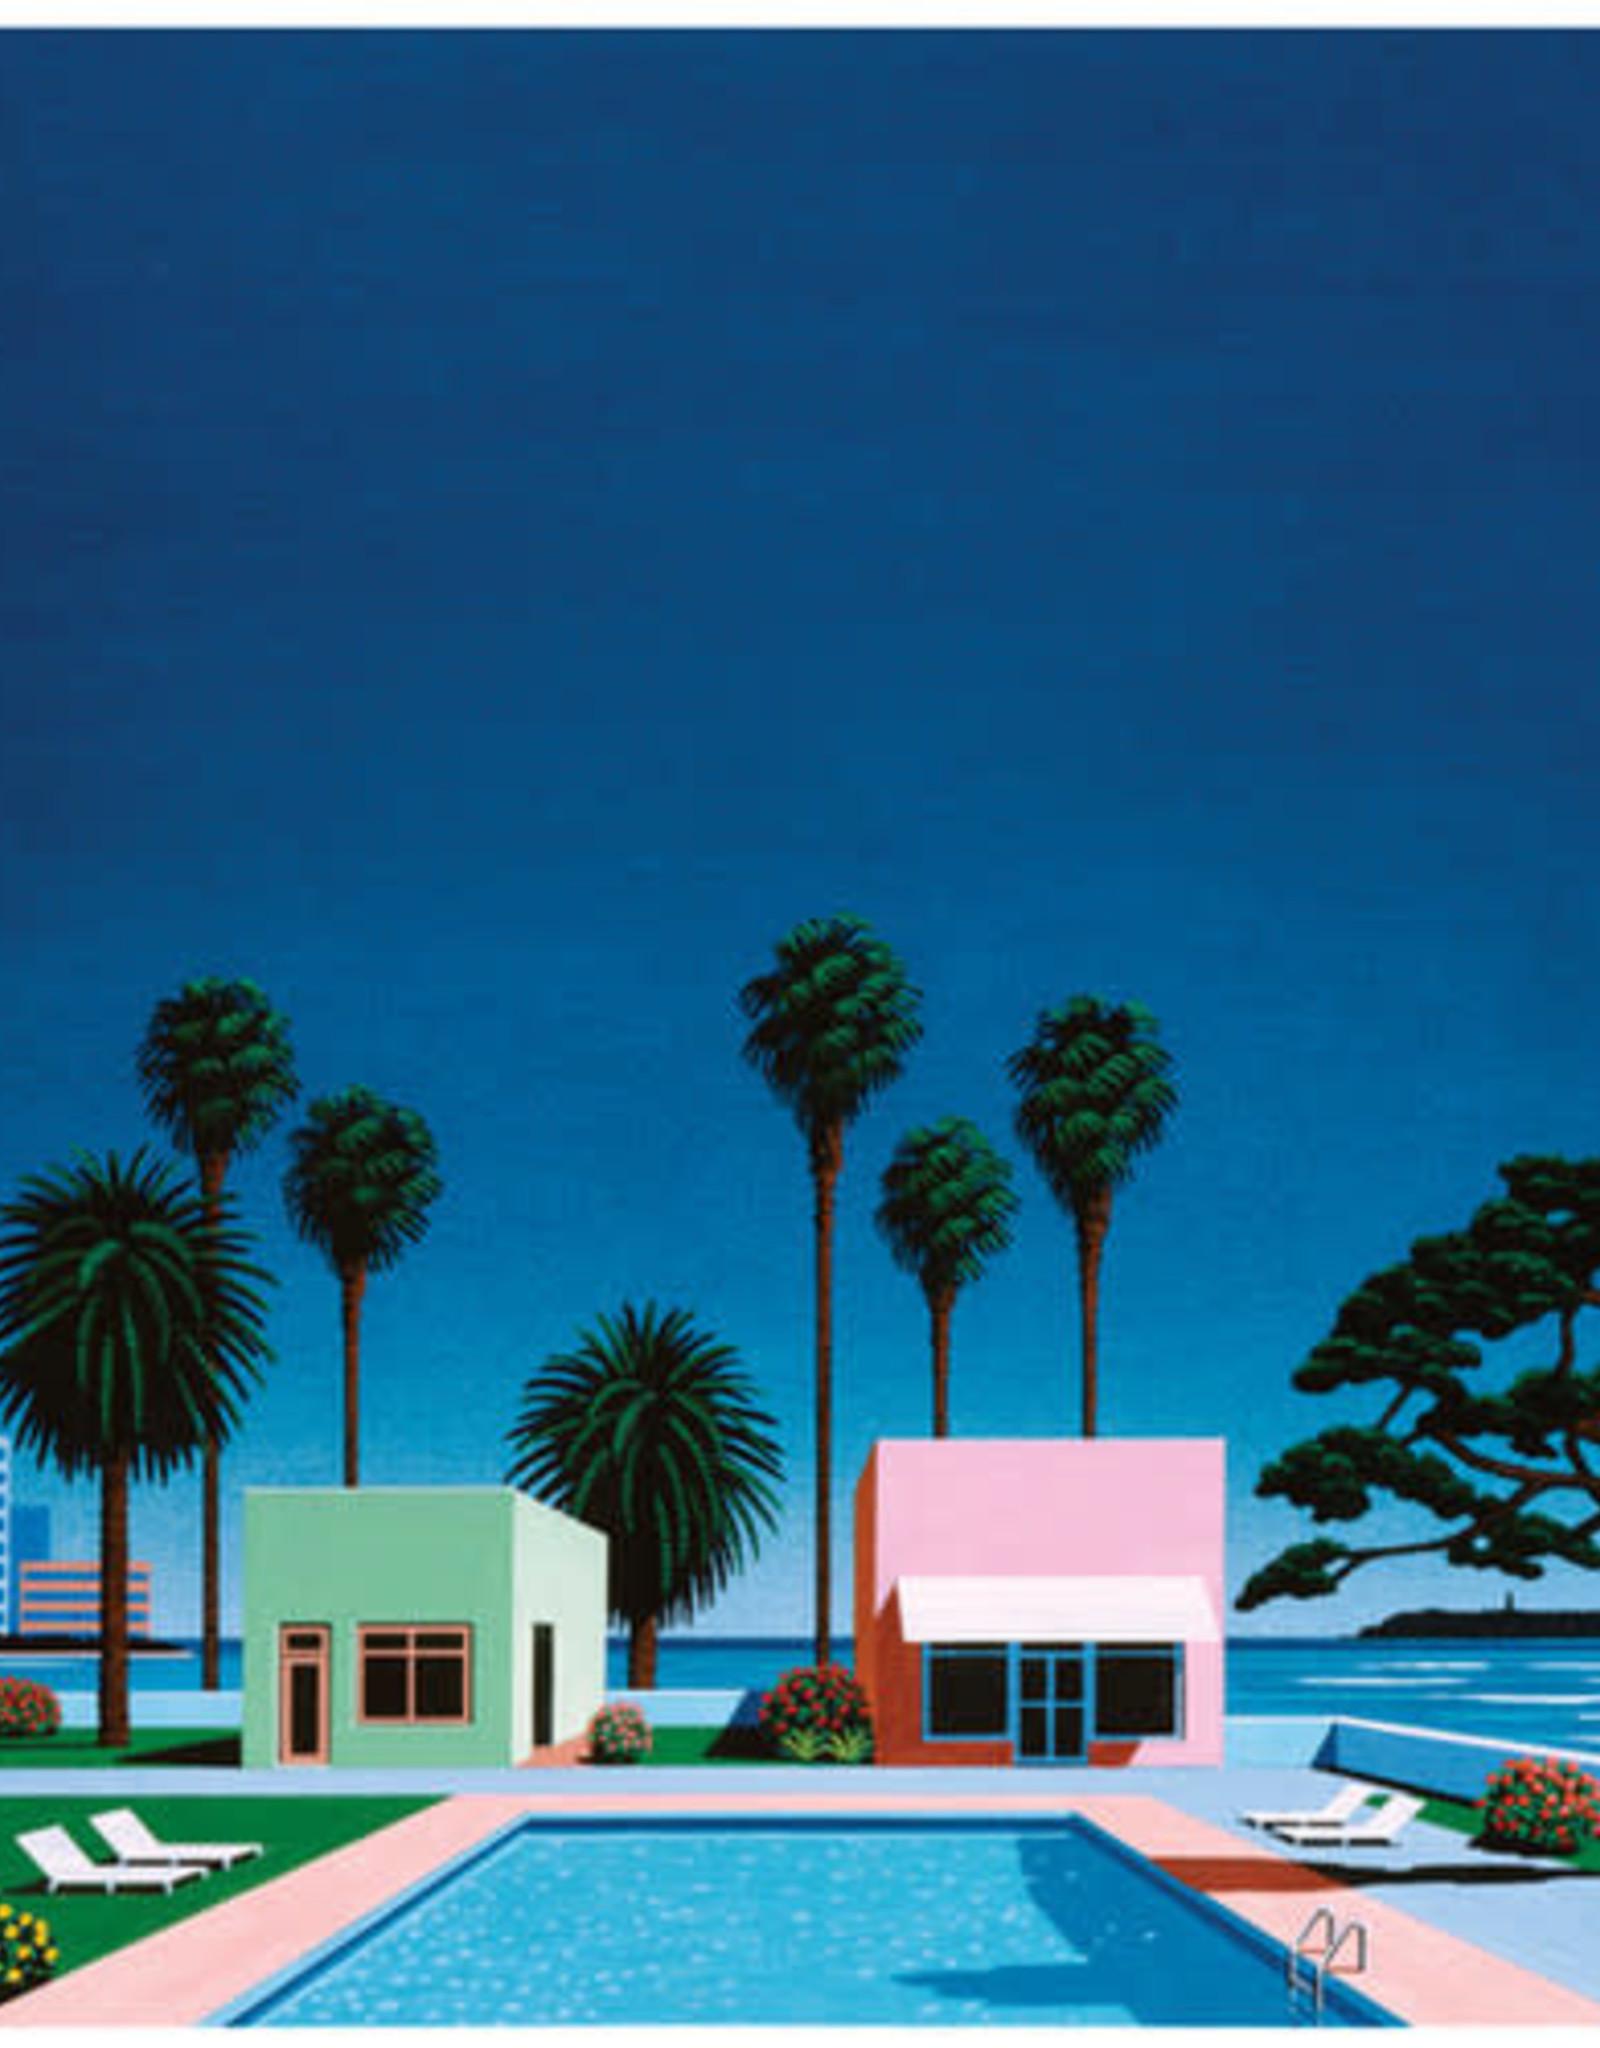 Various Artists - Pacific Breeze: Japanese City Pop, Aor & Boogie 1976-1986 (2Lp)